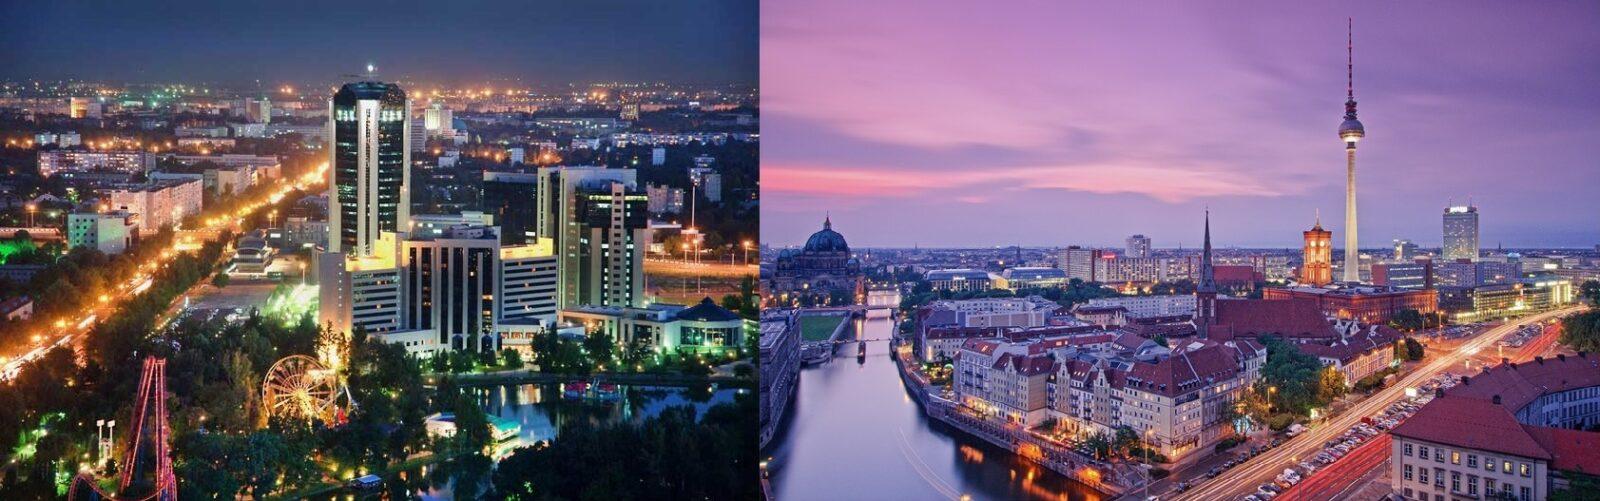 Ташкент - Берлин: побратимские отношения